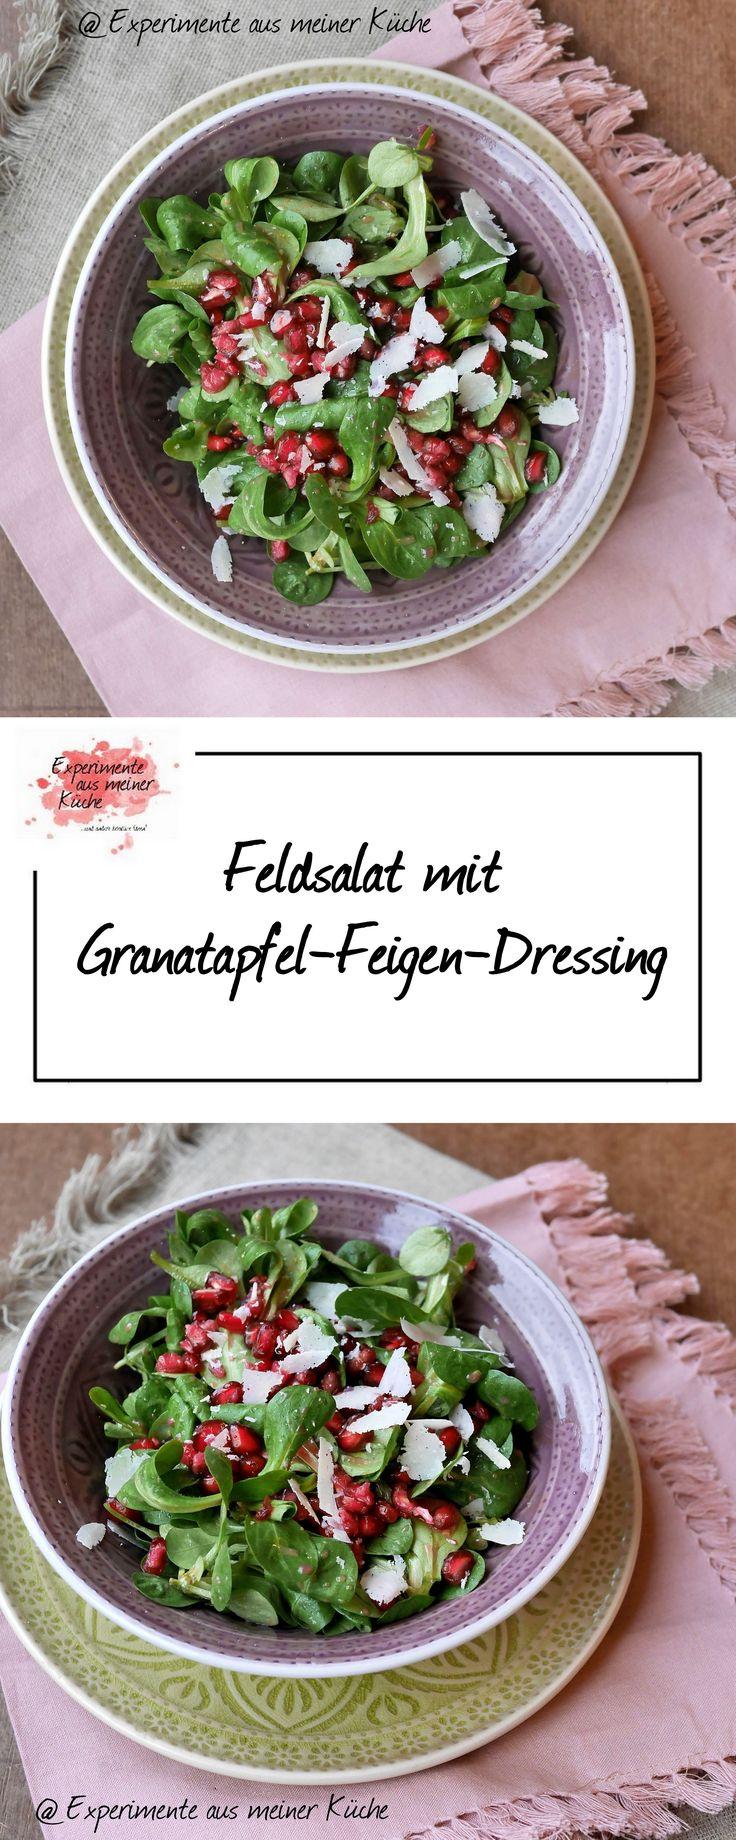 Feldsalat mit Granatapfel-Feigen-Dressing   Rezept   Essen   Vegetarisch